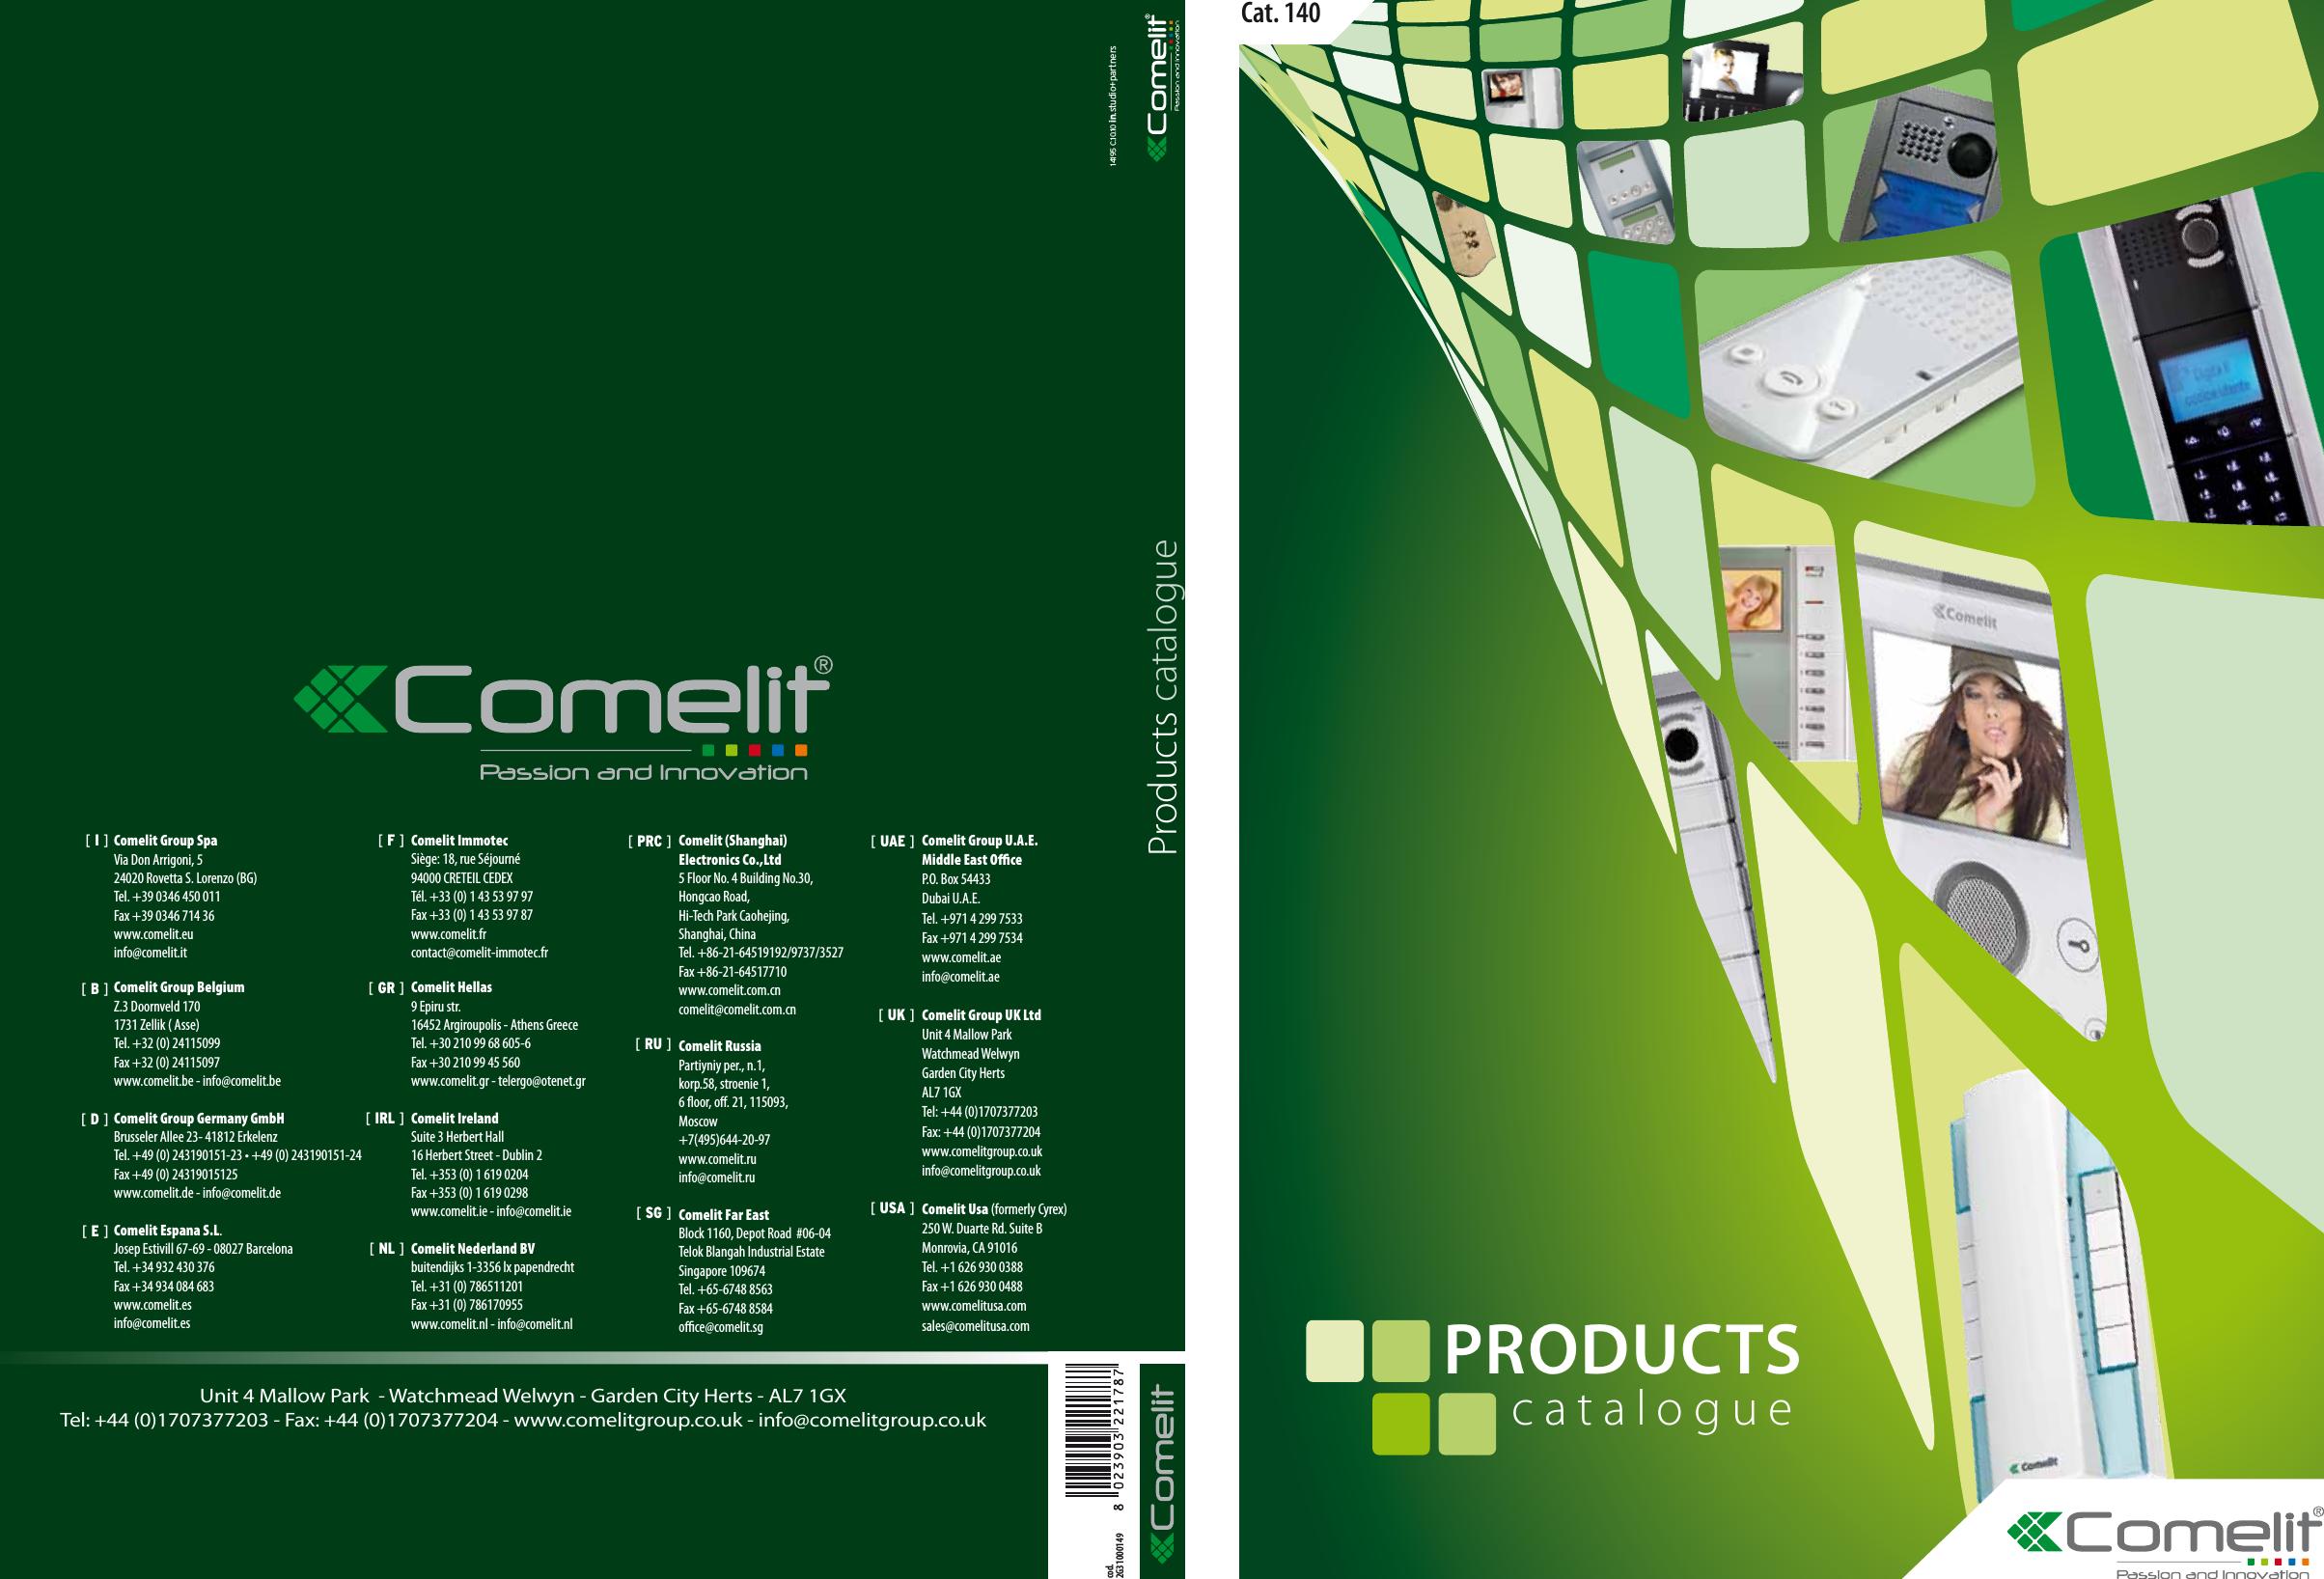 2602 COMELIT CITOFONO BASIC PER STYLEKIT 5